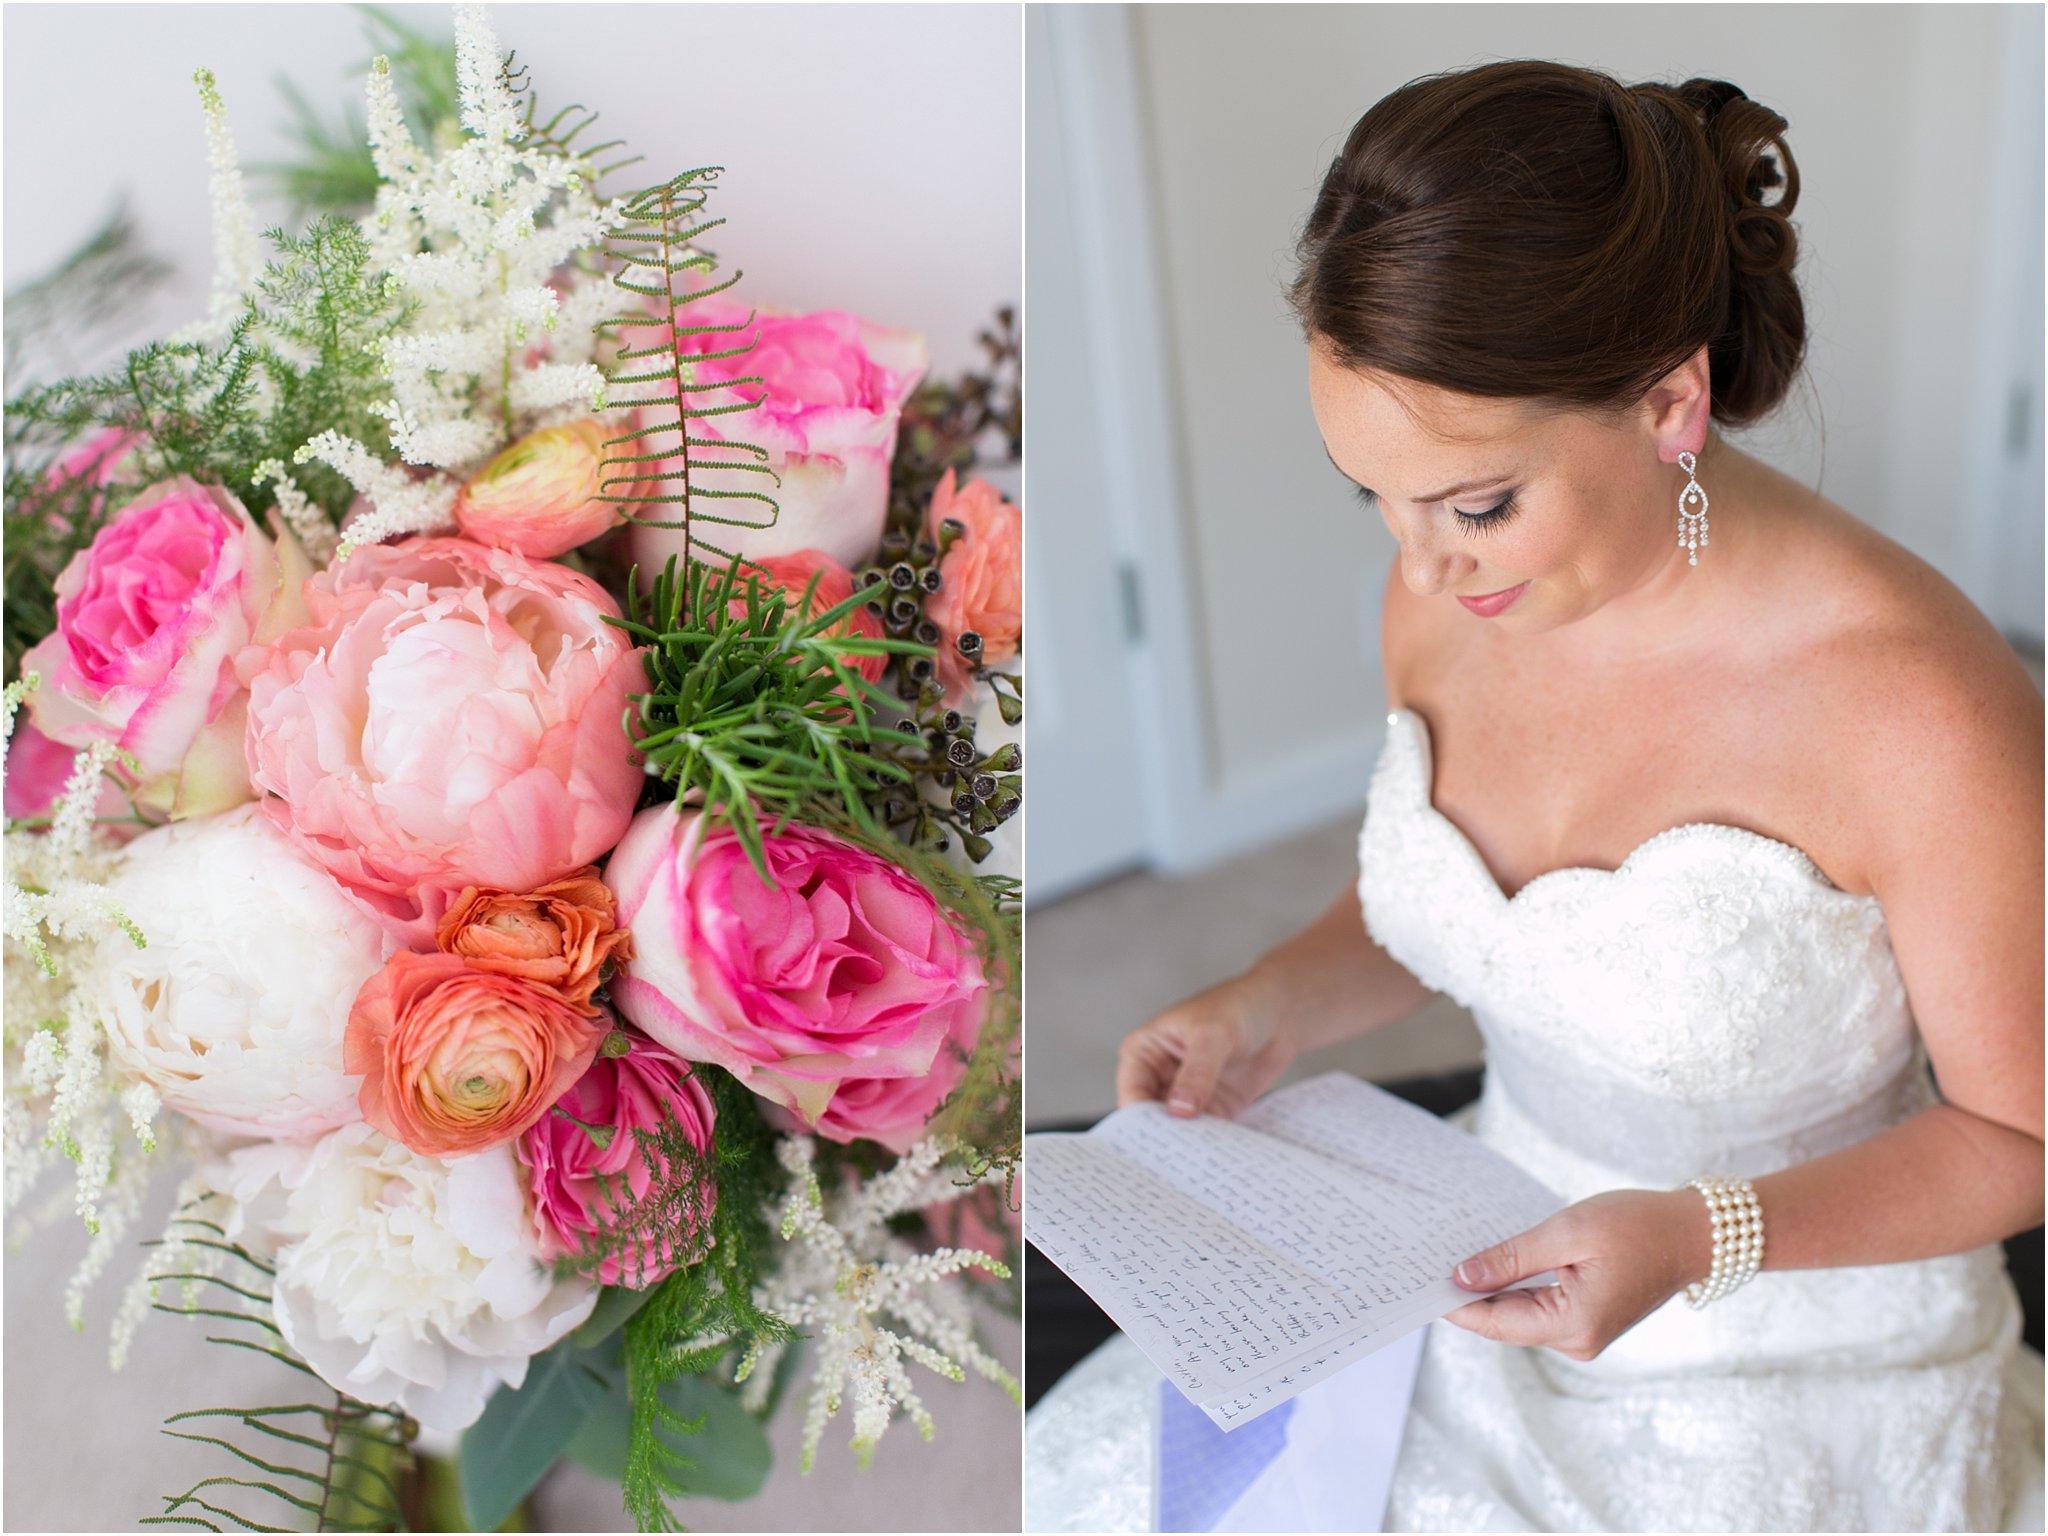 jessica_ryan_photography_wedding_photography_virginiabeach_virginia_candid_authentic_bride_tips_wedding_planning_tips_bridal_tips_1984